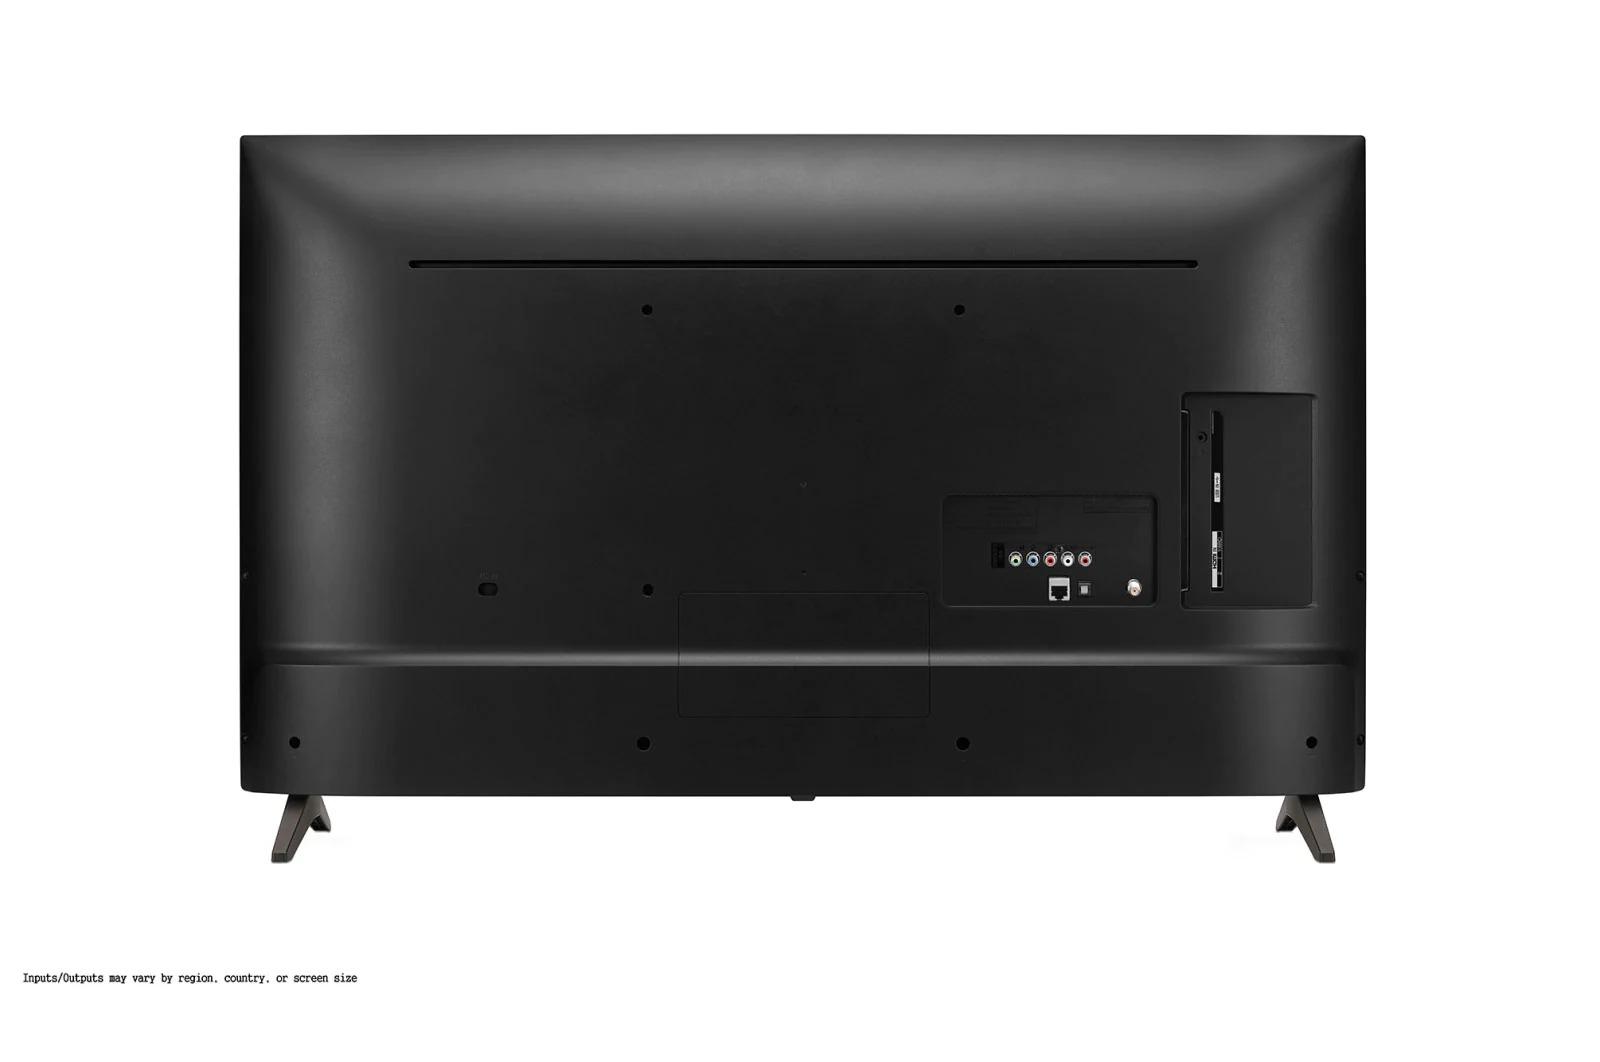 LG (43LK5760PTA) 43 (109cm) Full HD Smart TV